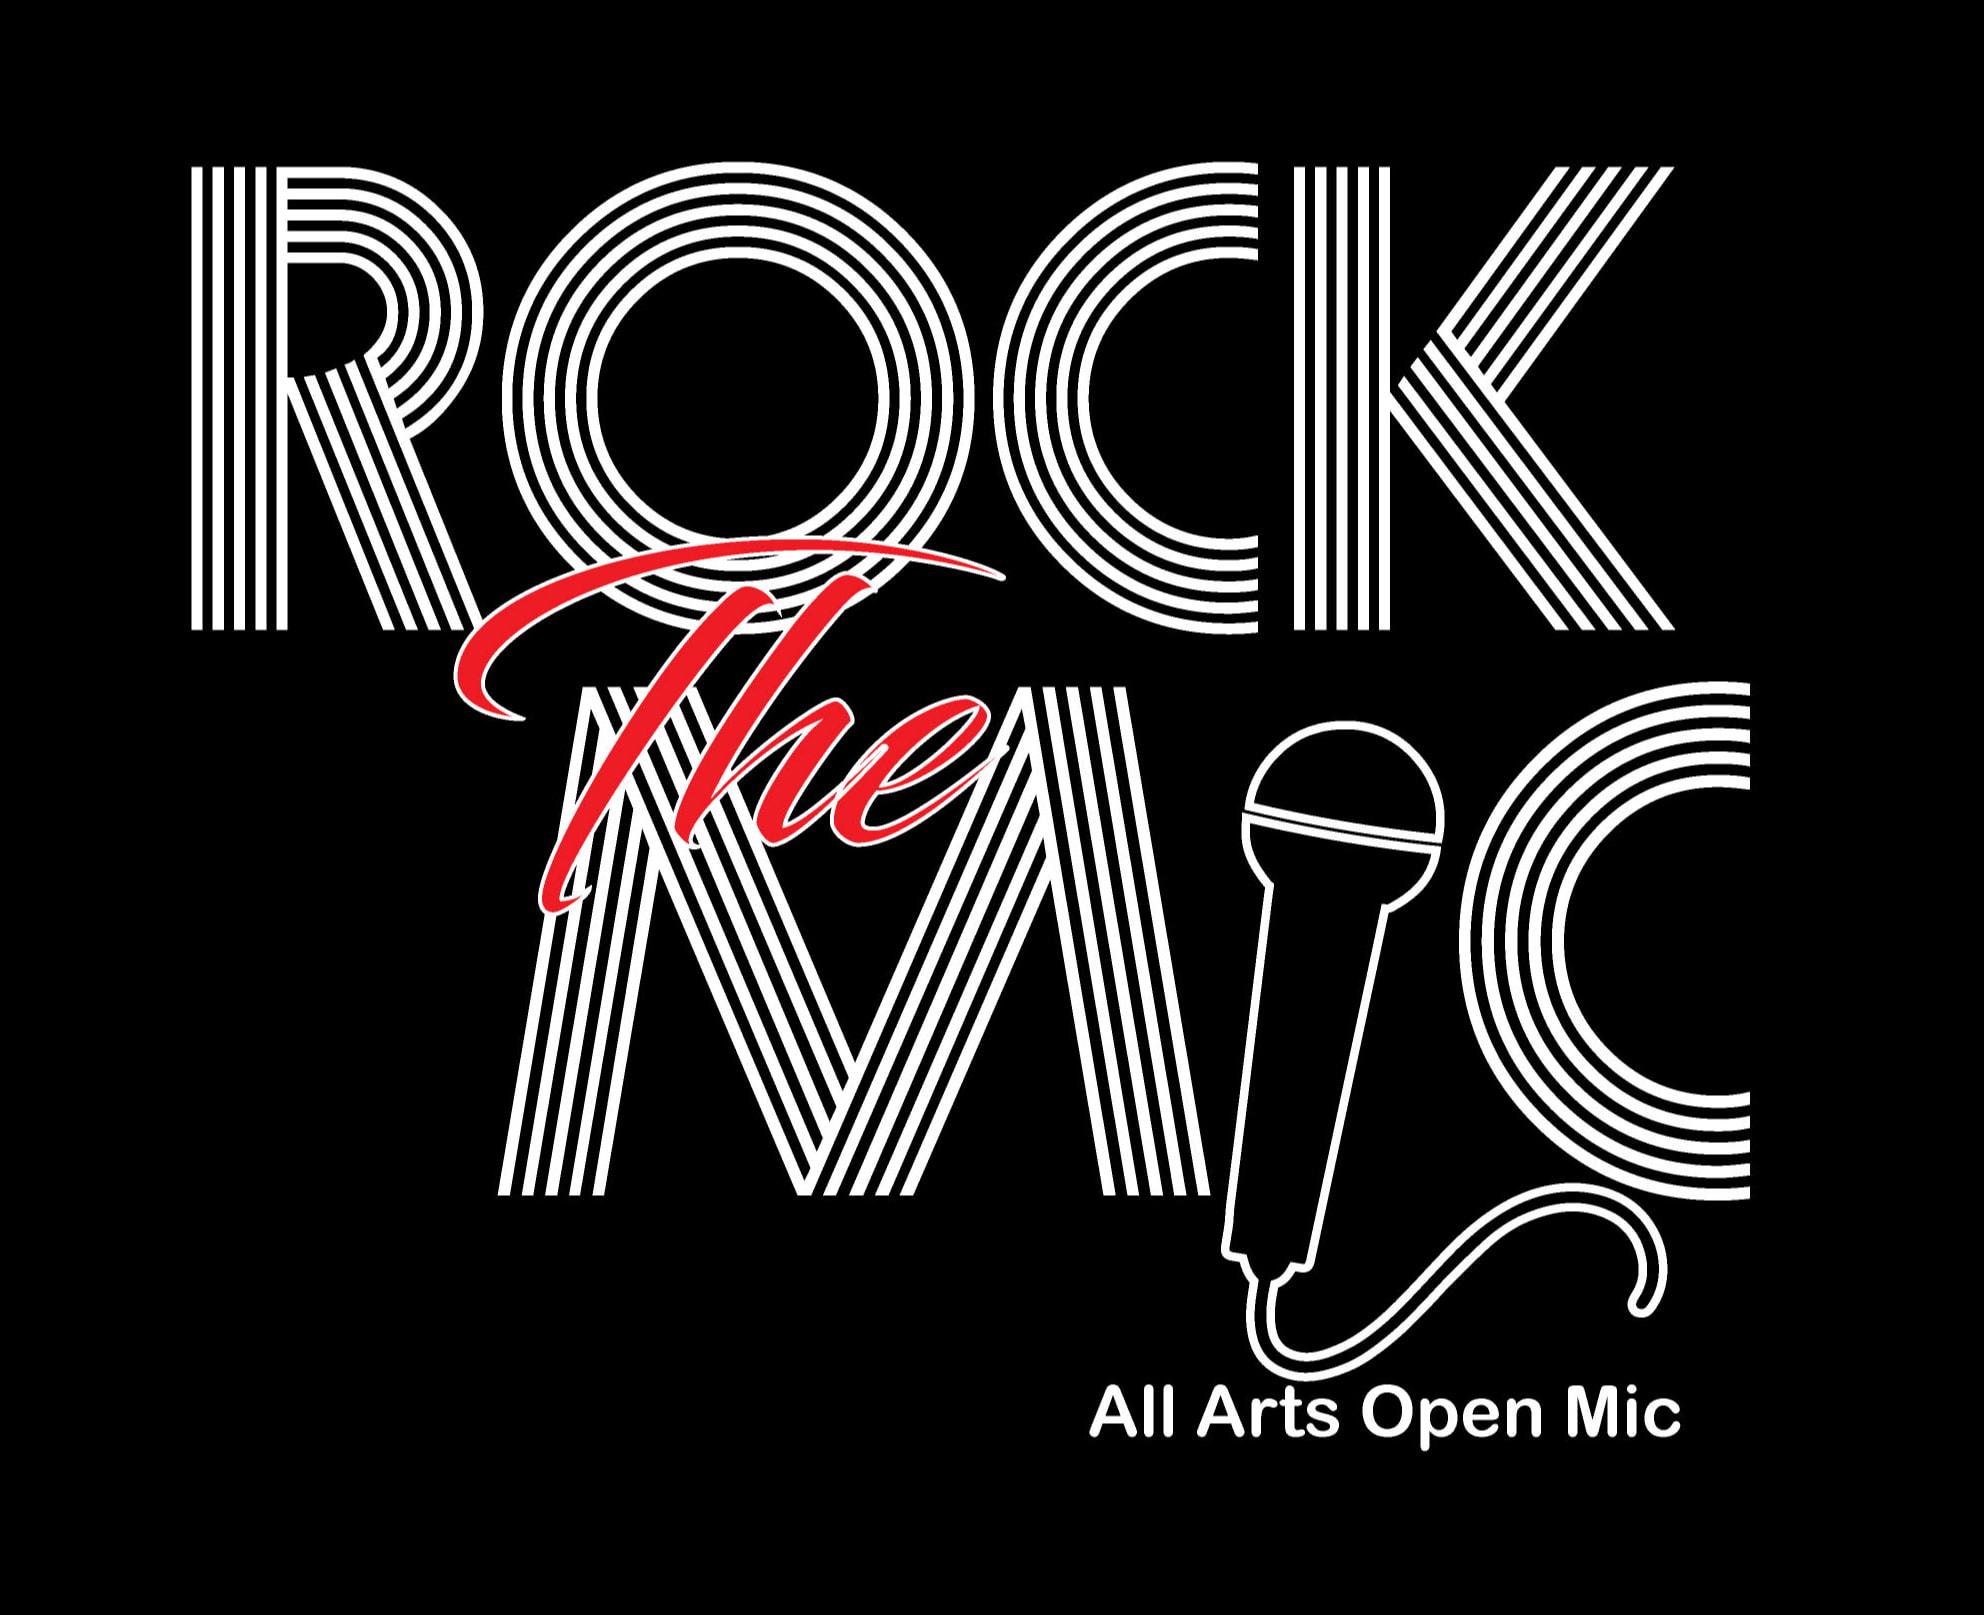 Rock The Mic All Arts